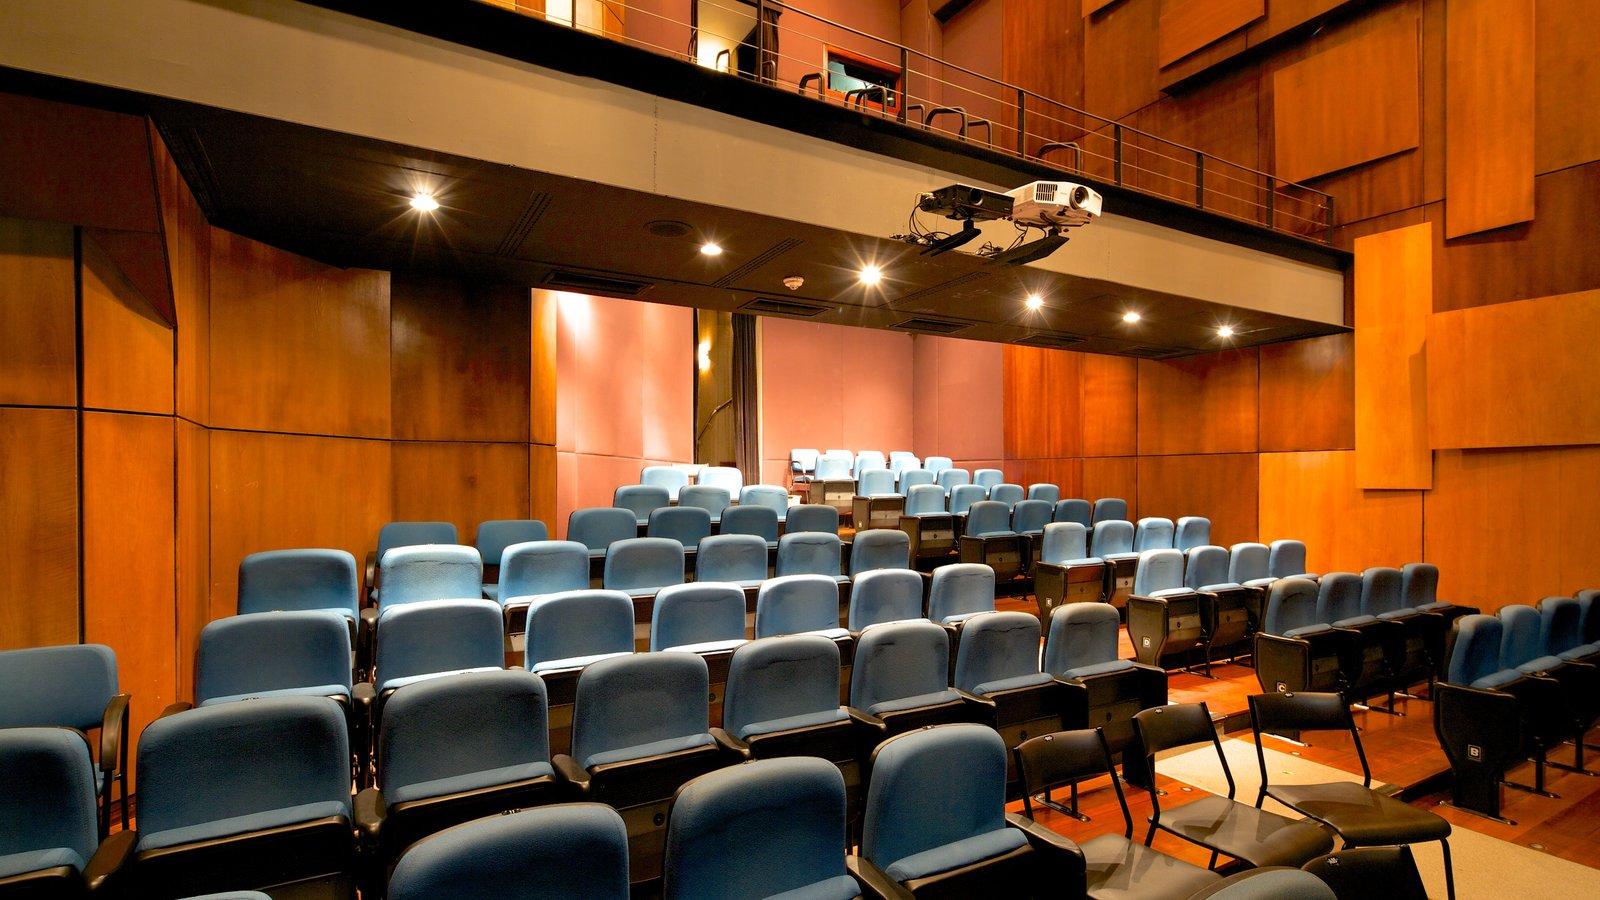 Centro Cultural Banco do Brasil que inclui vistas internas